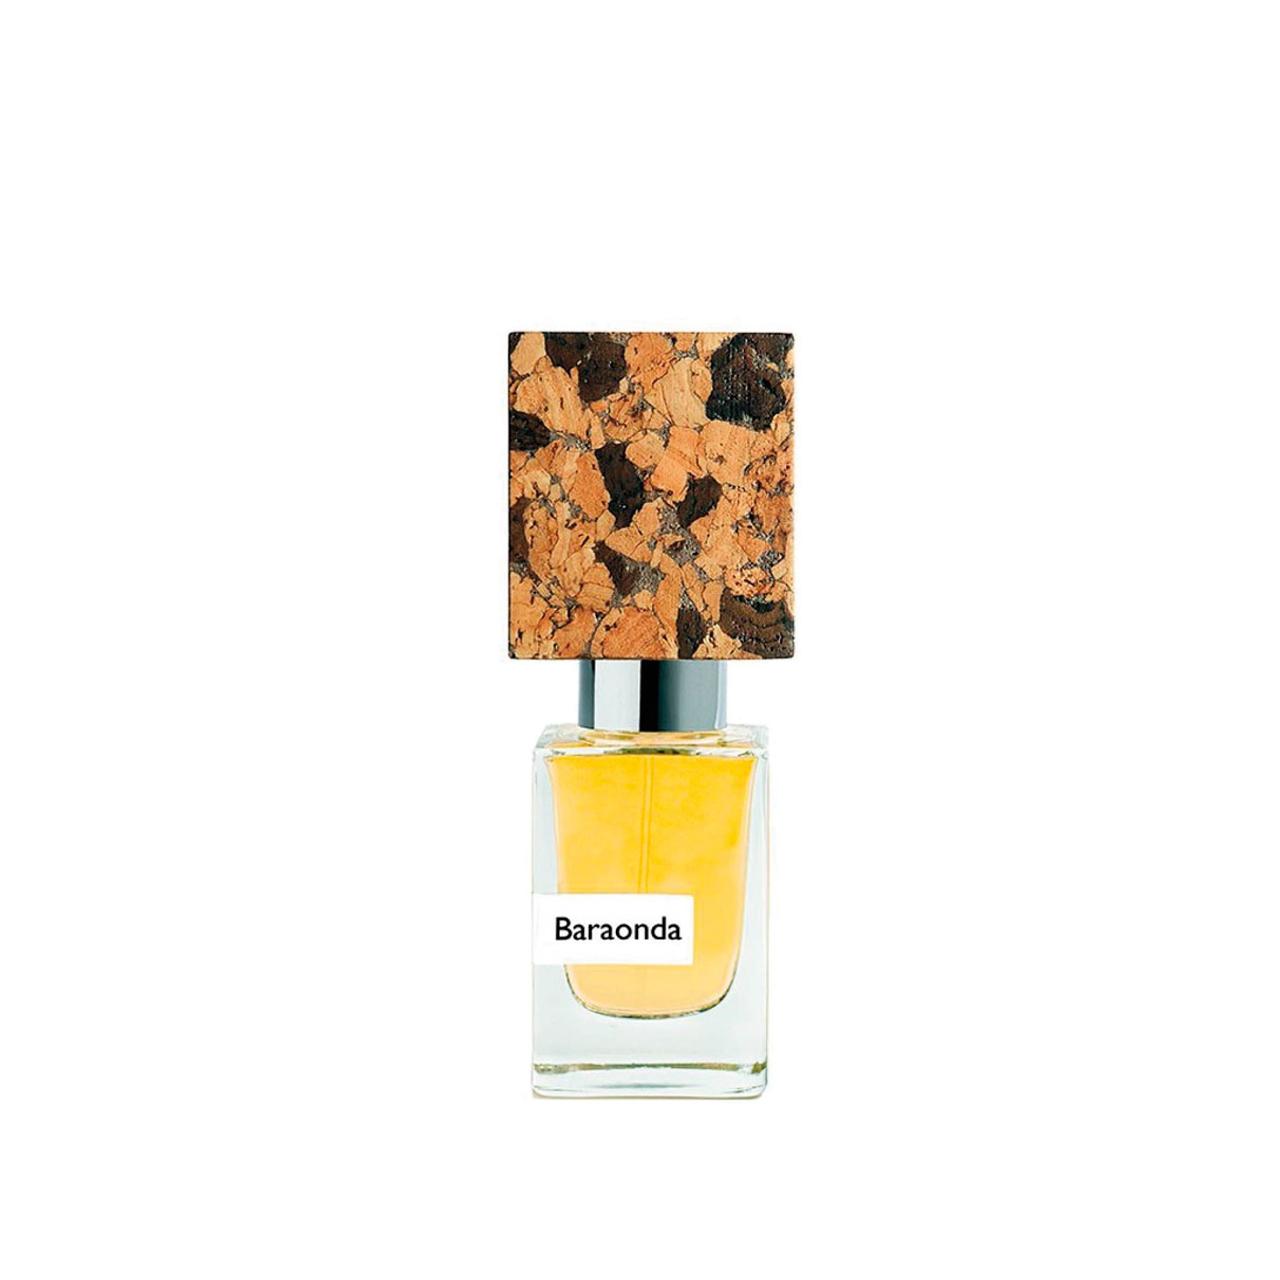 Baraonda - Extrait de Parfum